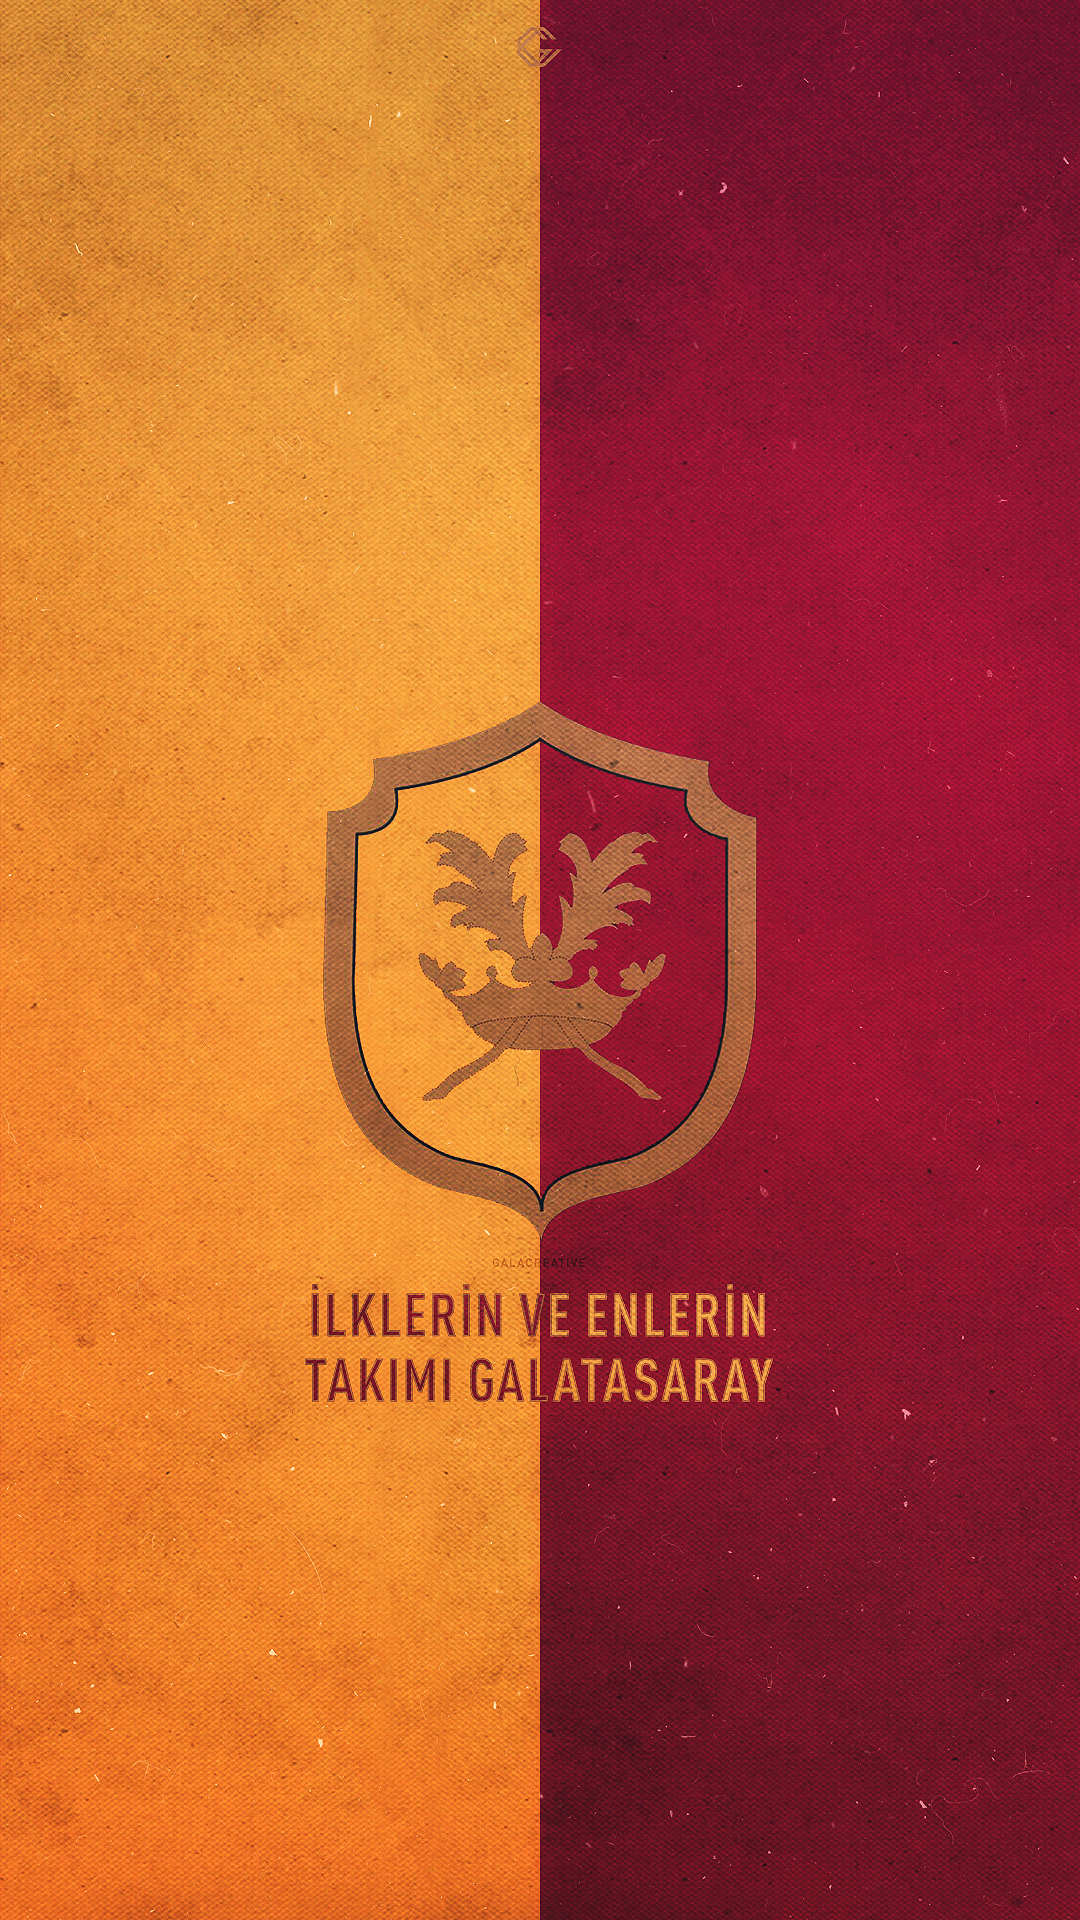 Epingle Par Beyzanur Sur Galatasaray